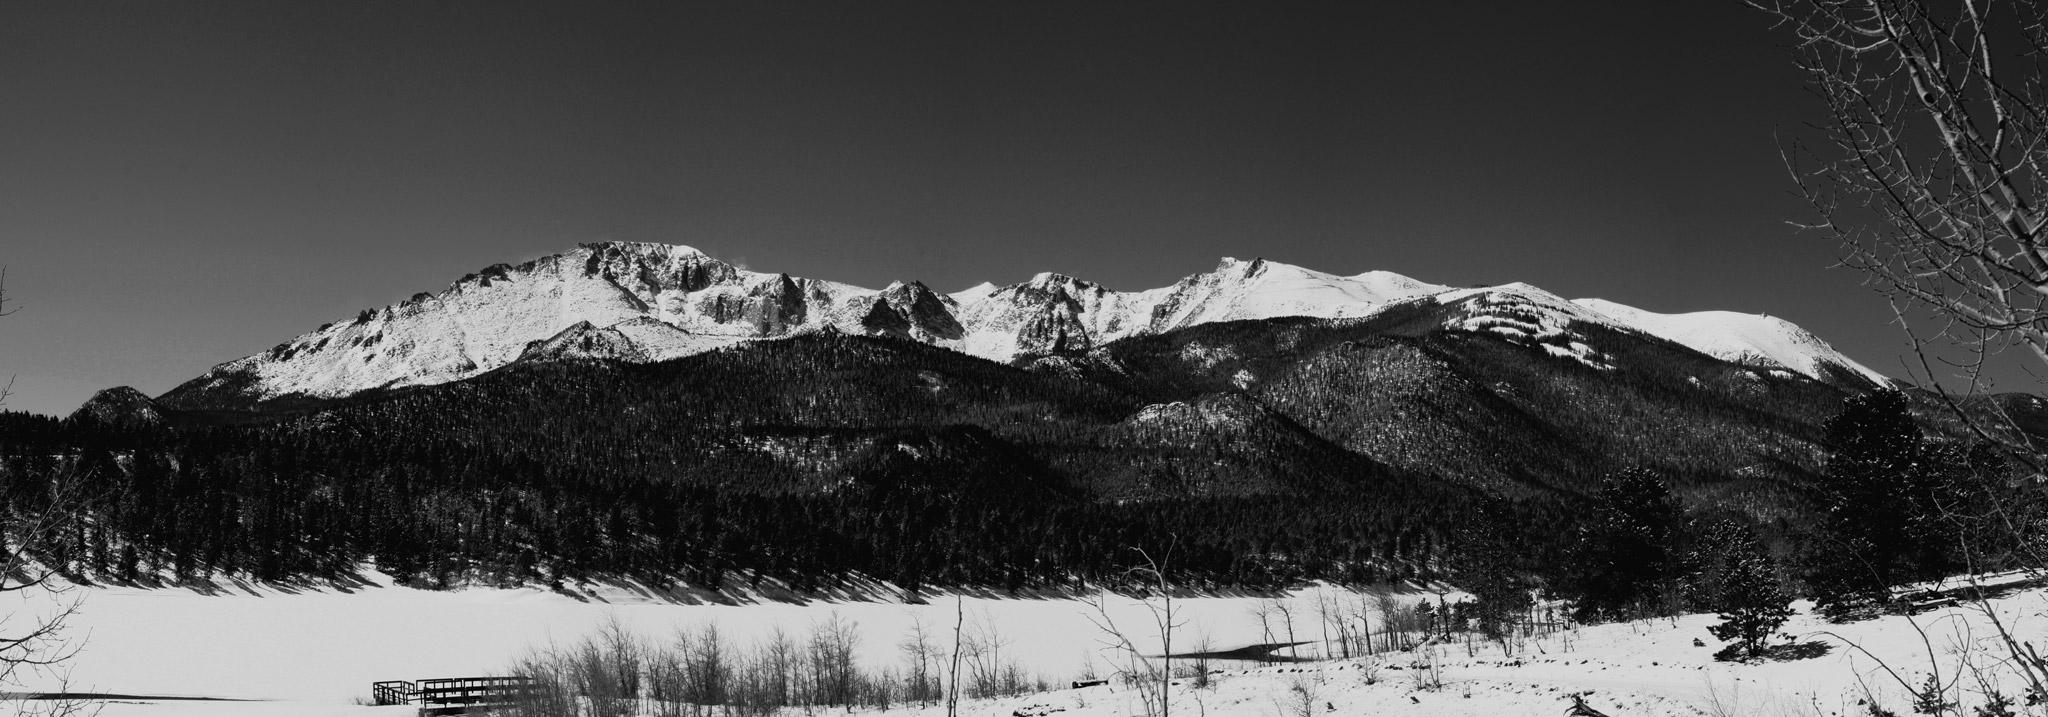 landscape photo of Pikes Peak Mountain